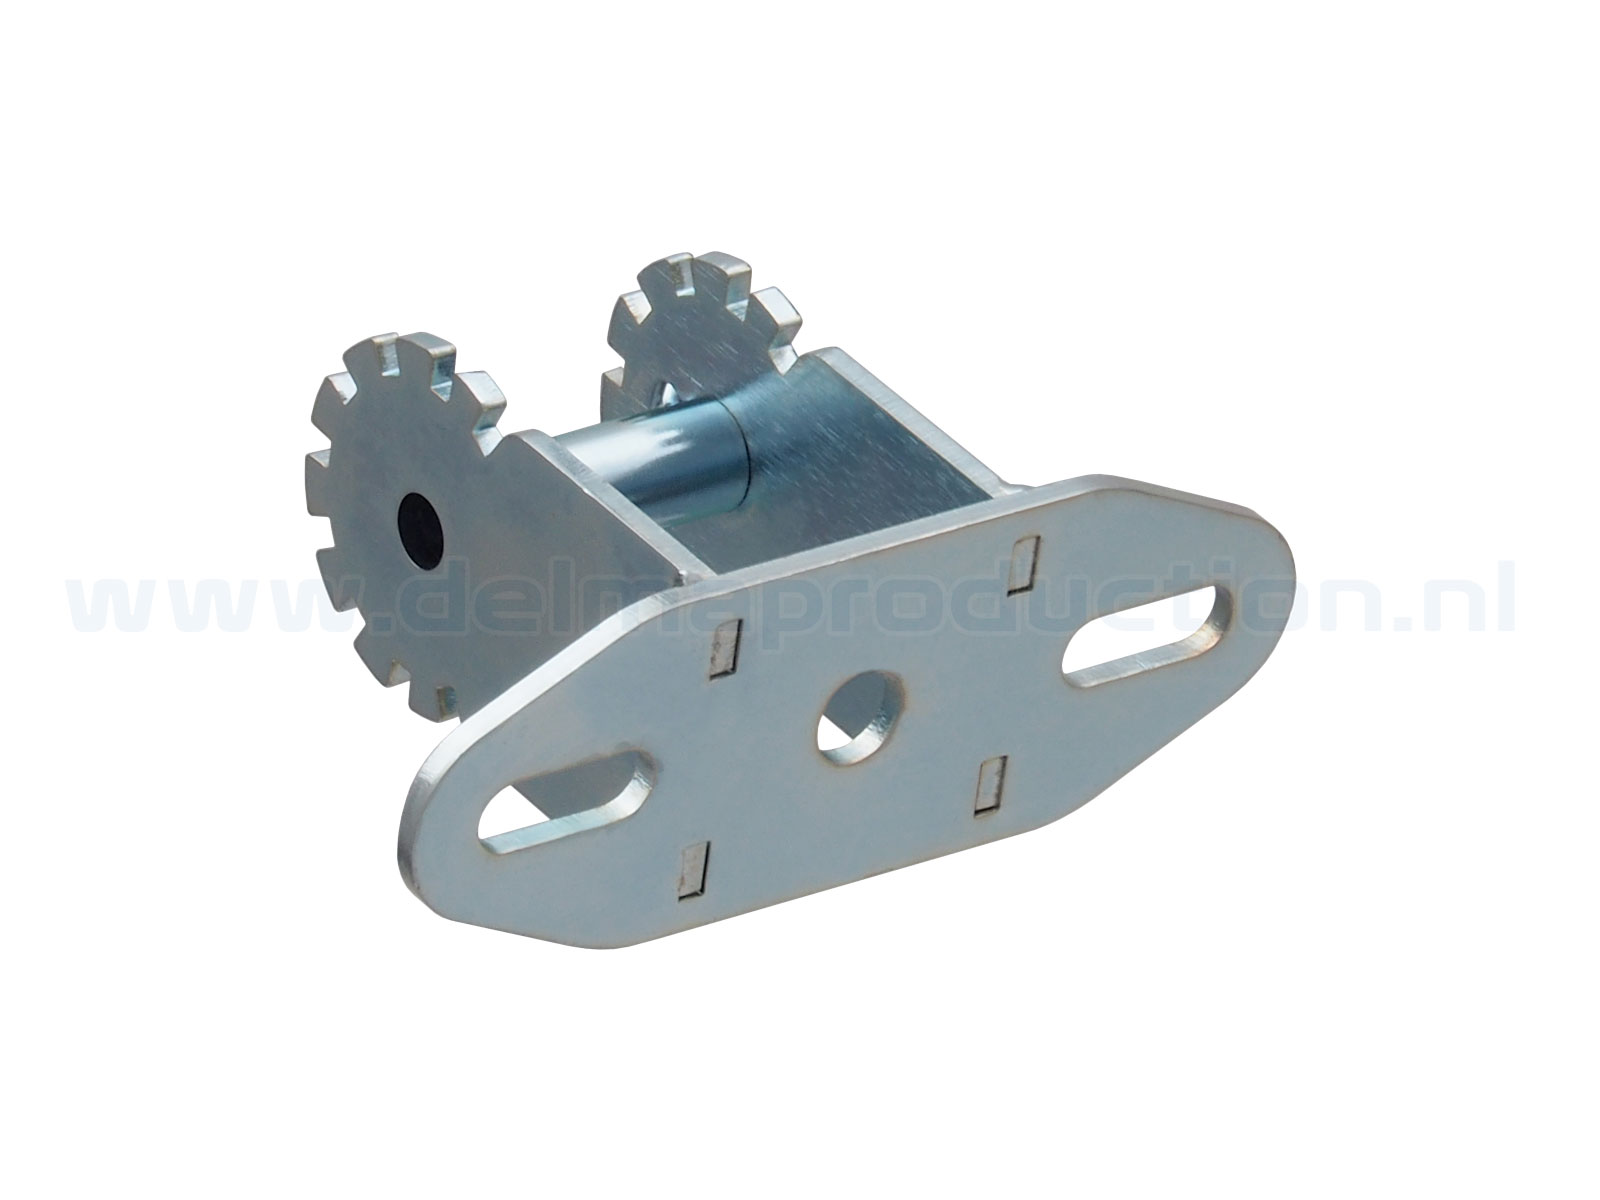 Quick adjustment universal mounting 59-86 mm (1)